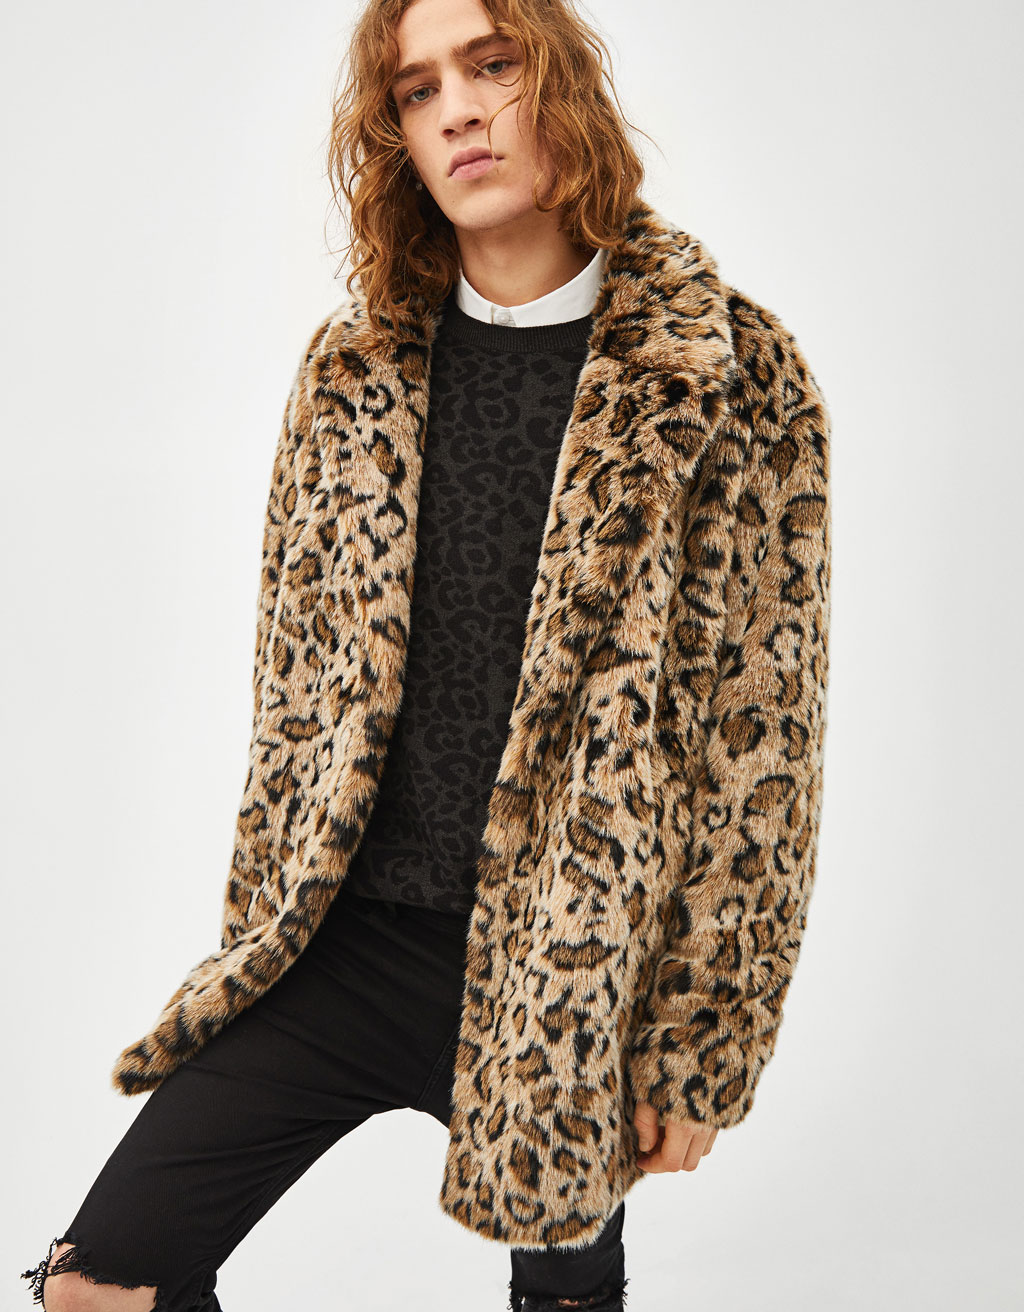 Leopard print fuzzy coat